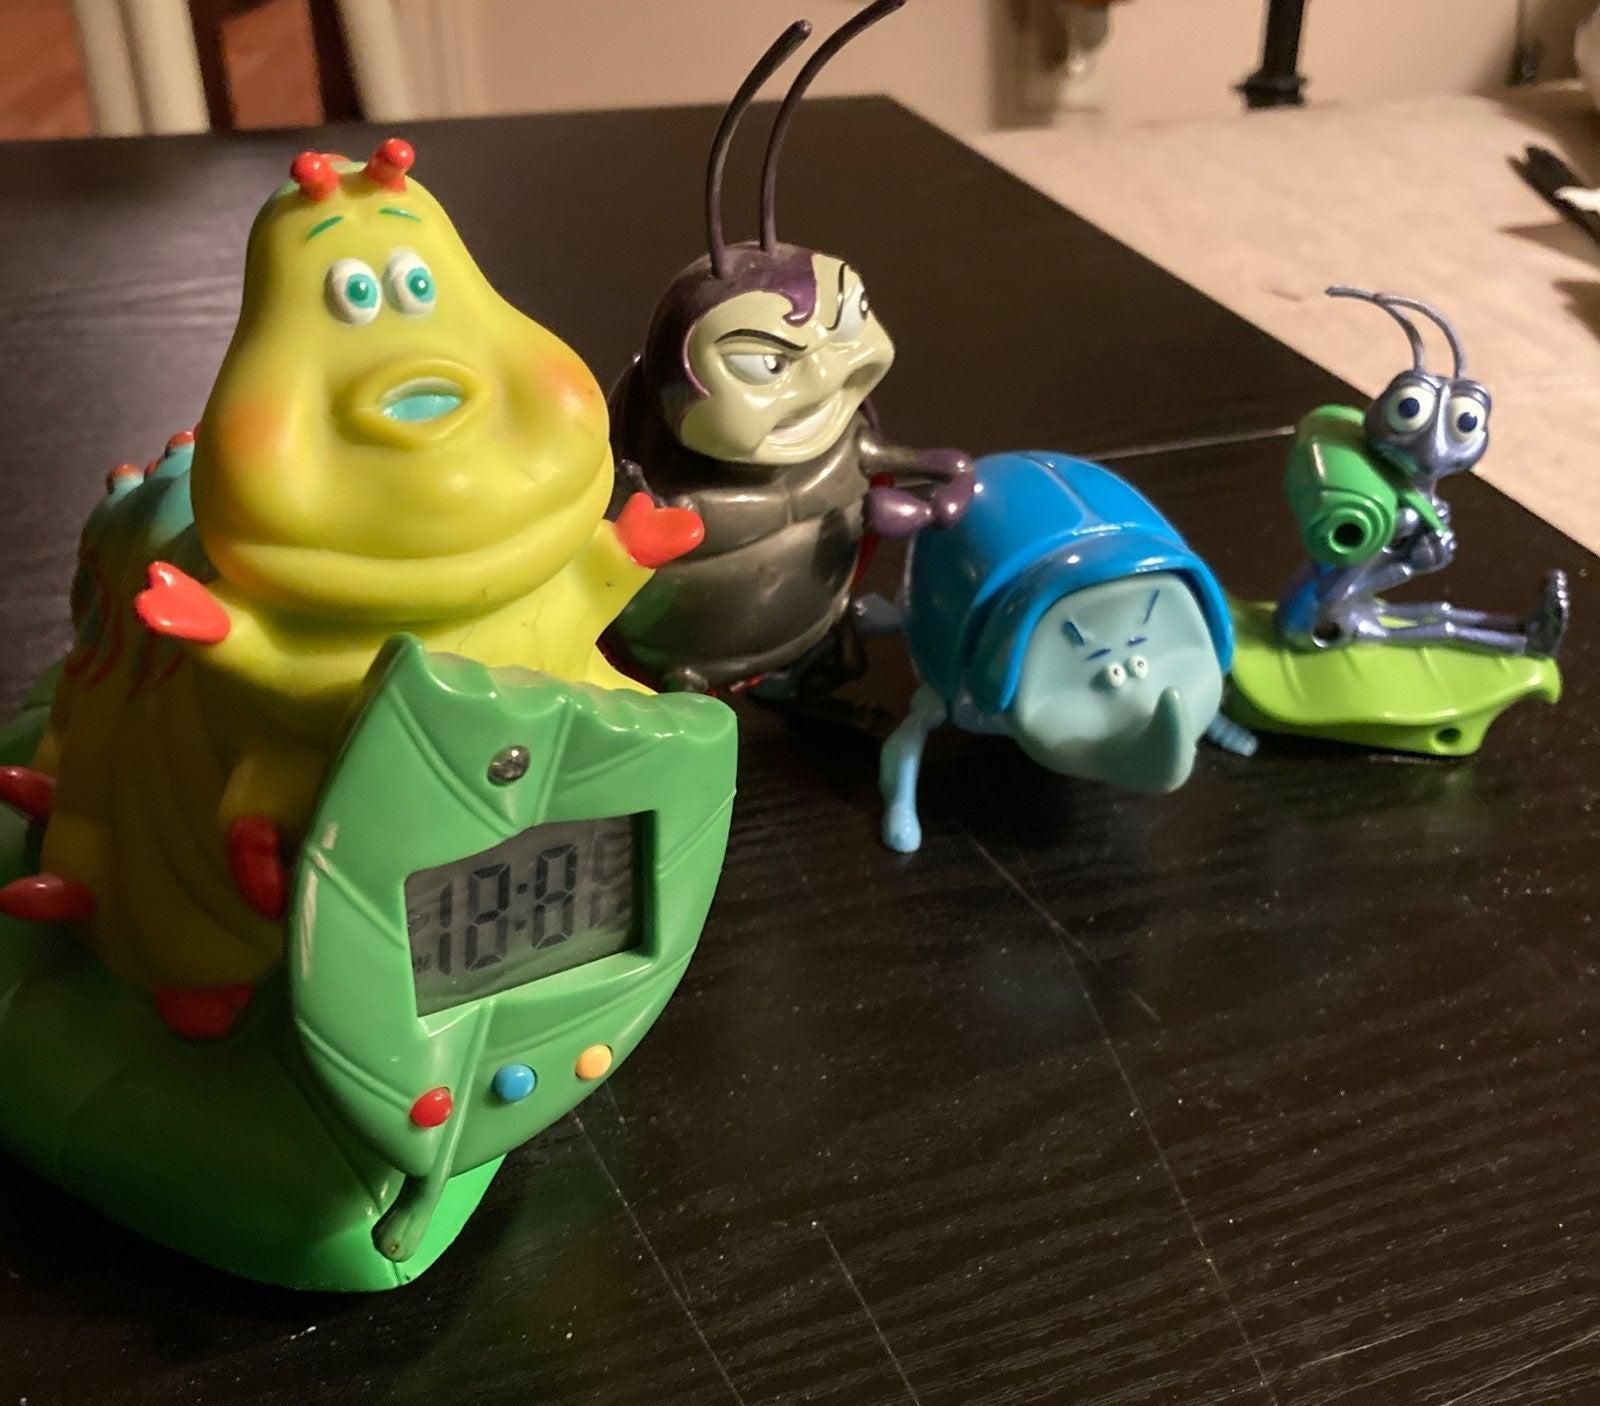 Disney A Bug's Life Alarm Clock + 3 Toys